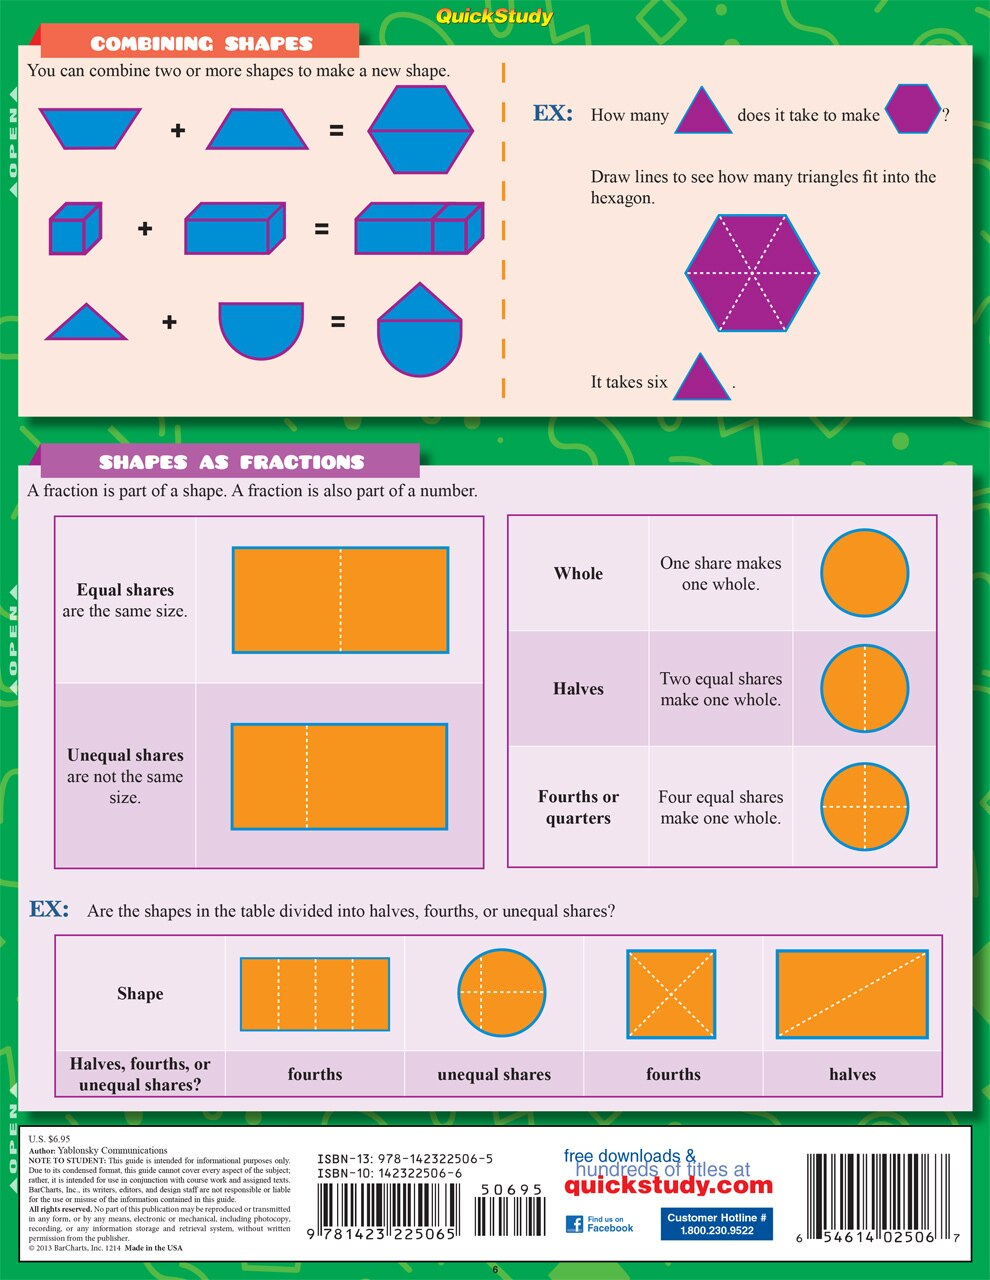 Quick Study QuickStudy Math: 1st Grade Laminated Study Guide BarCharts Publishing Mathematics Study Outline Back Image